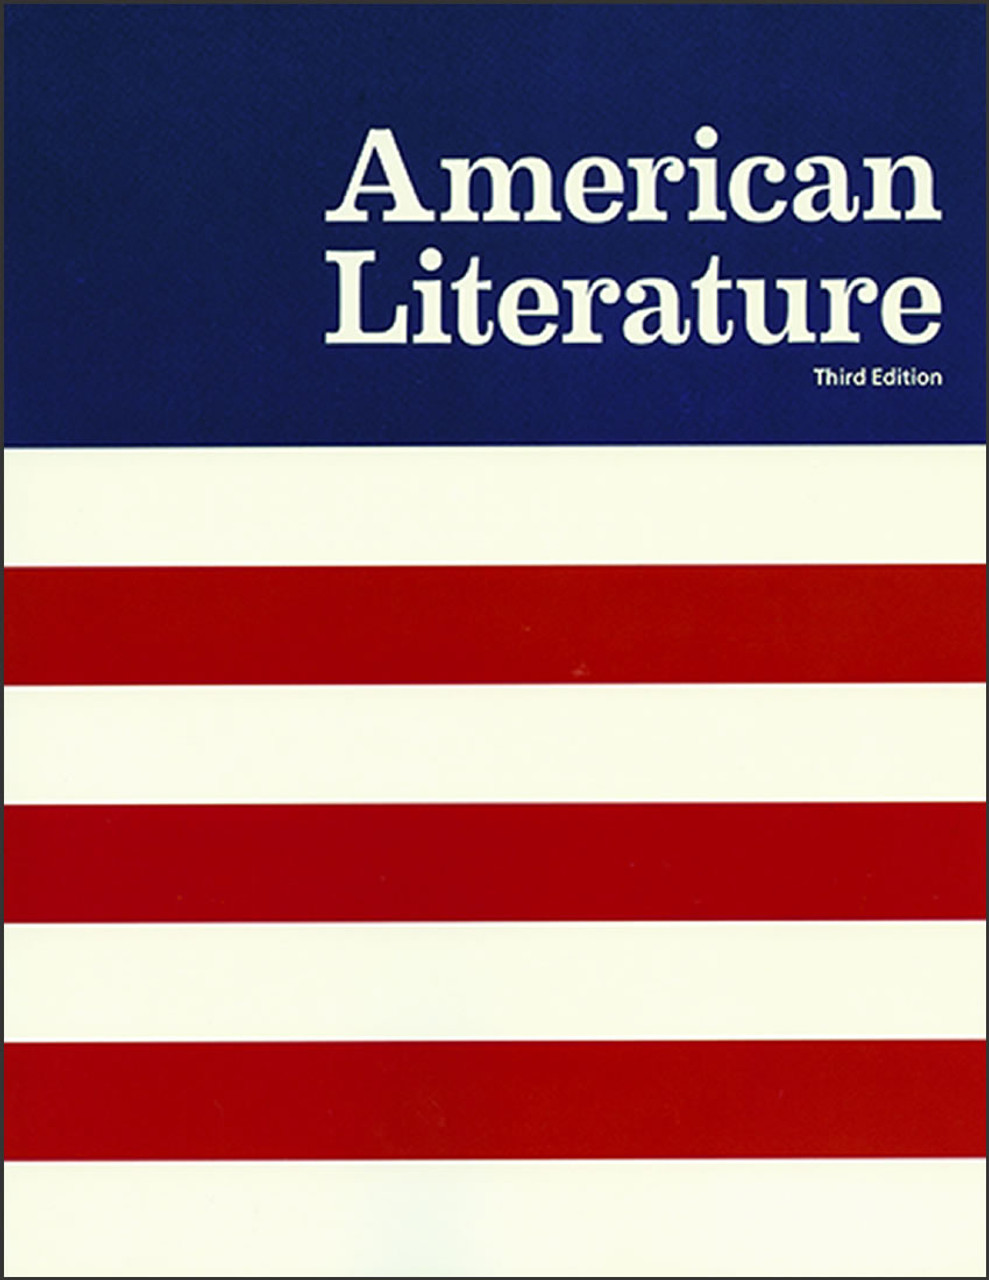 American Literature, 3rd edition